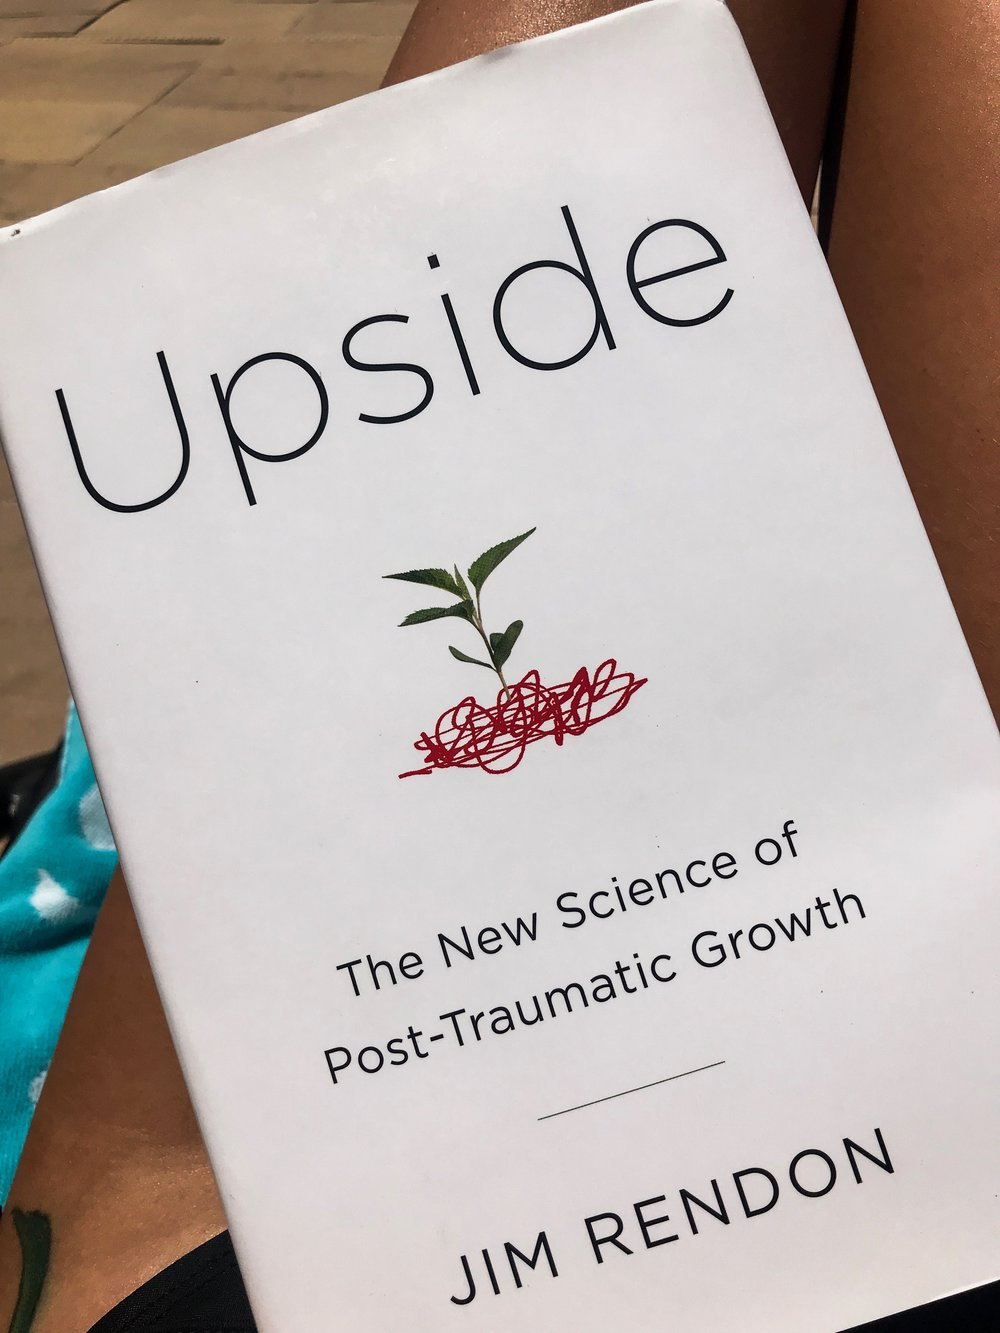 UPSIDE.JPG